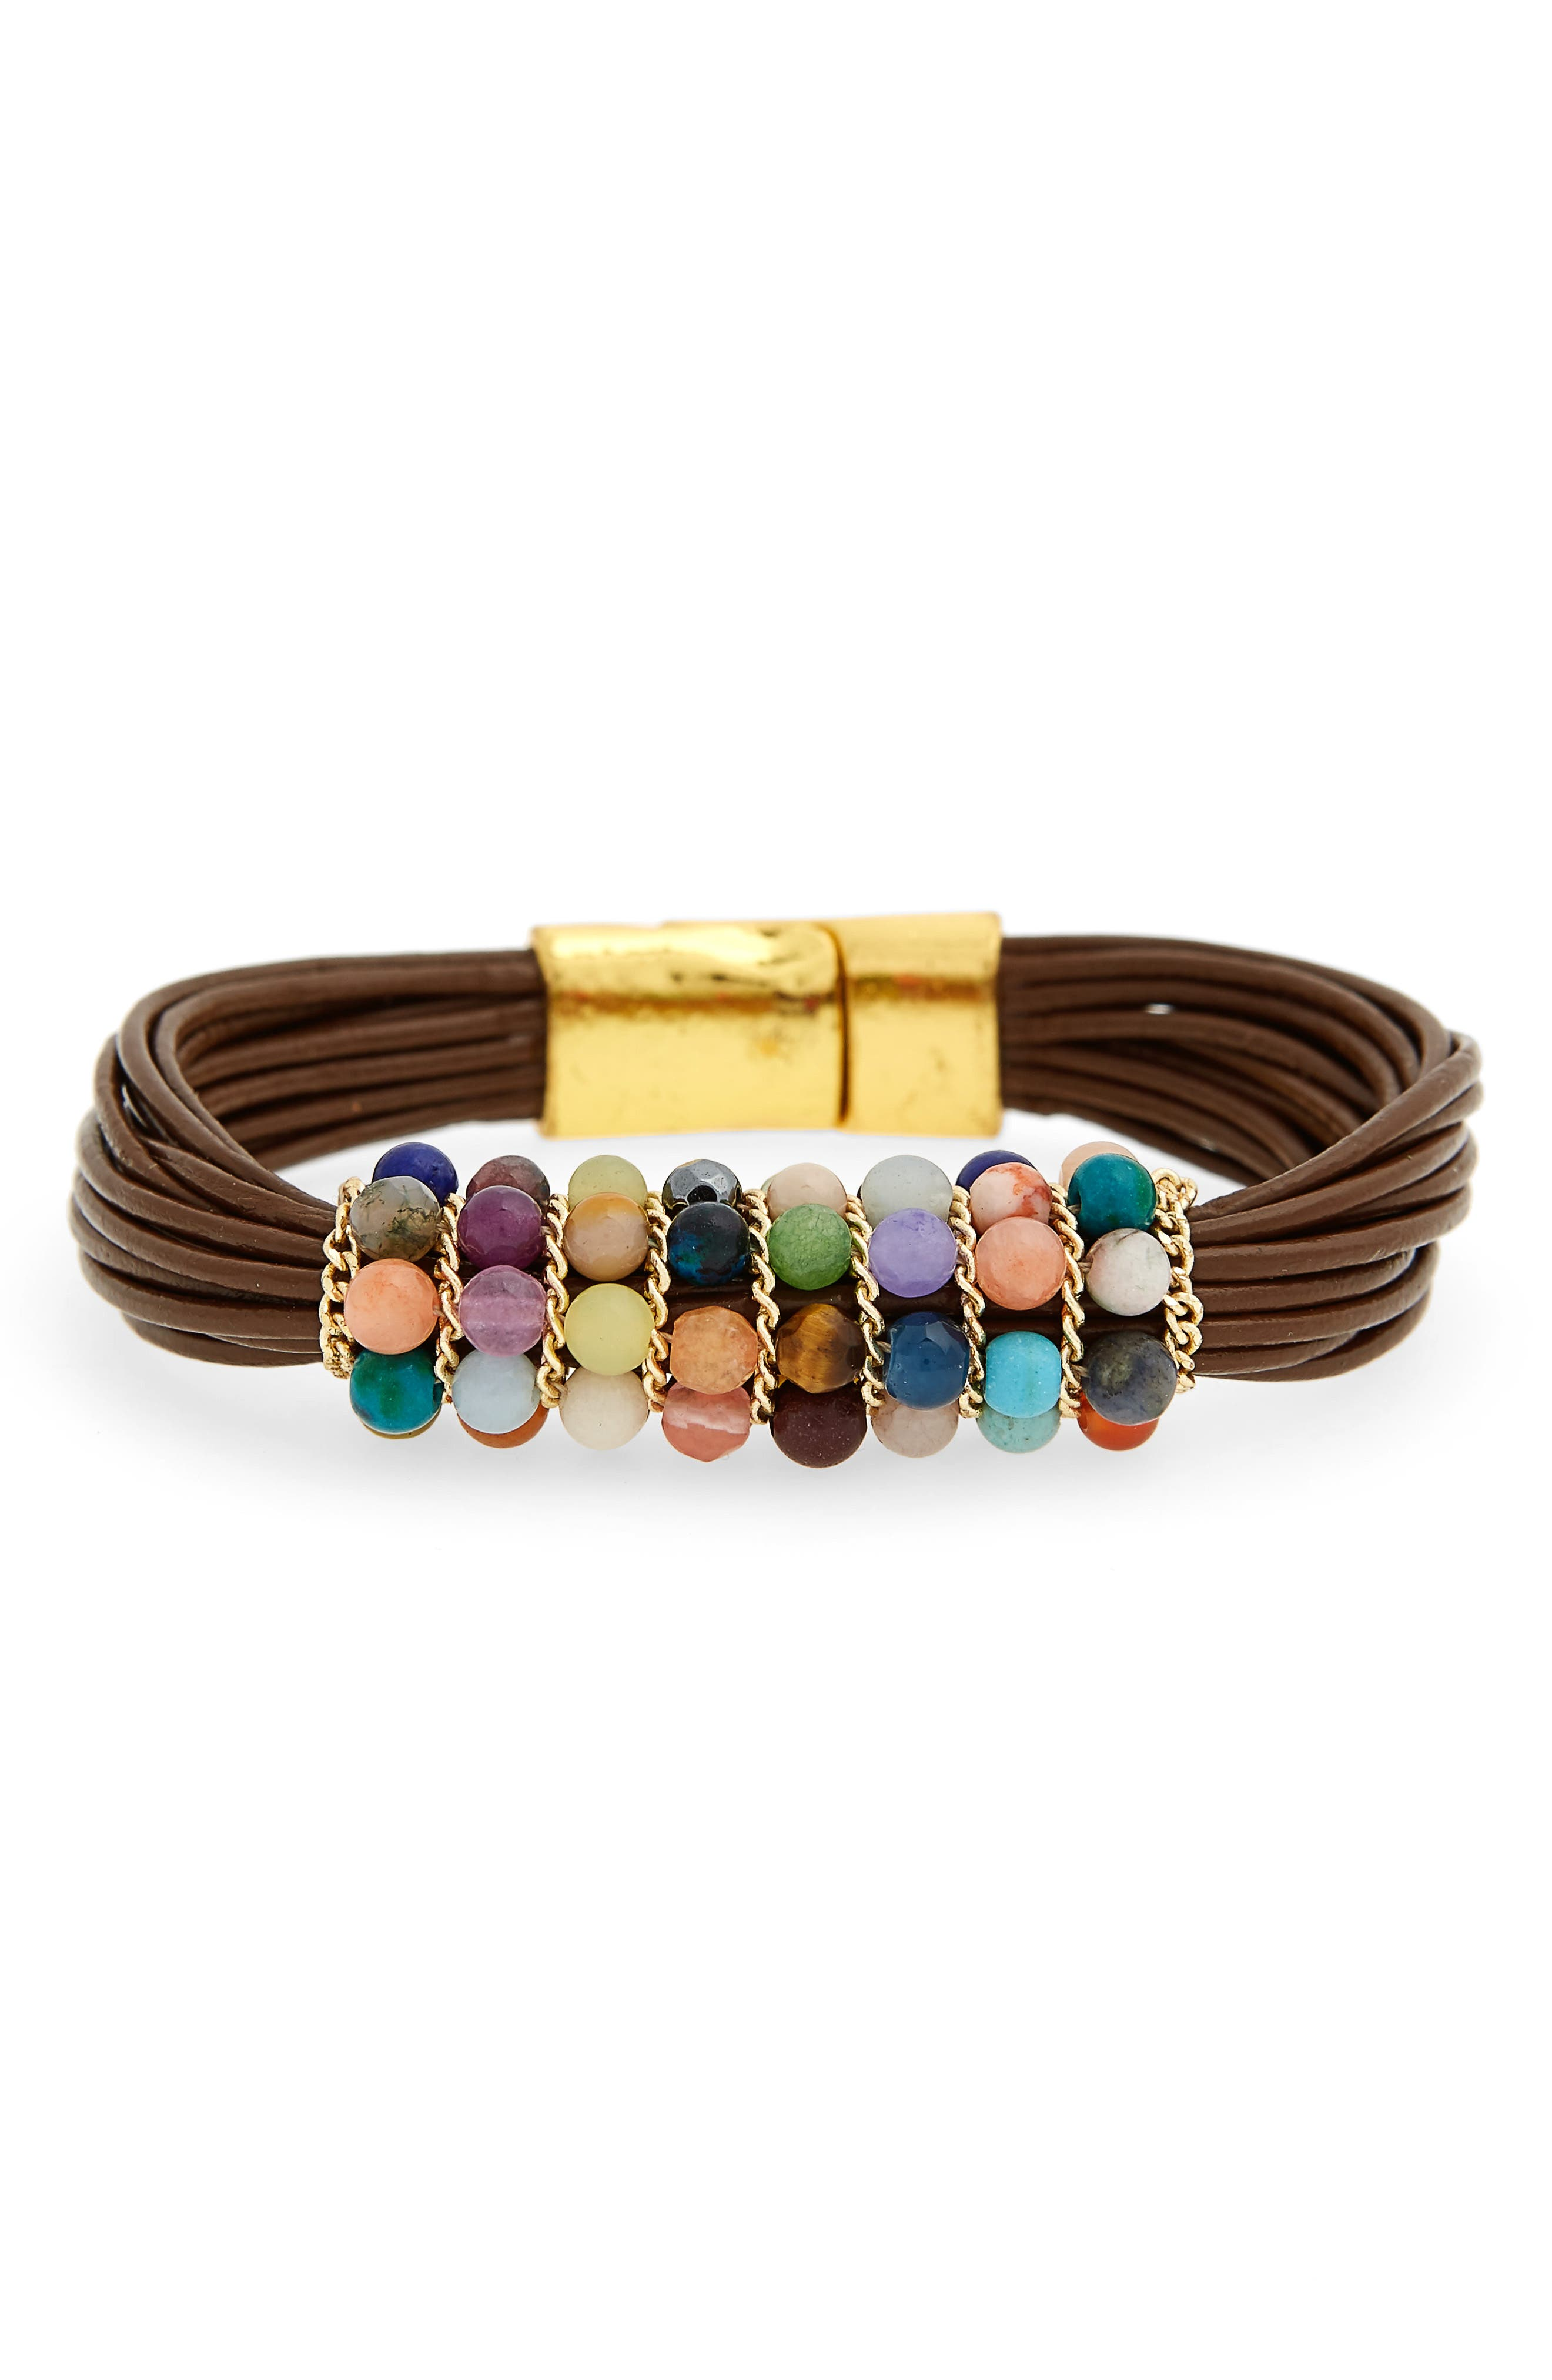 Nakamol Design Stone & Leather Bracelet